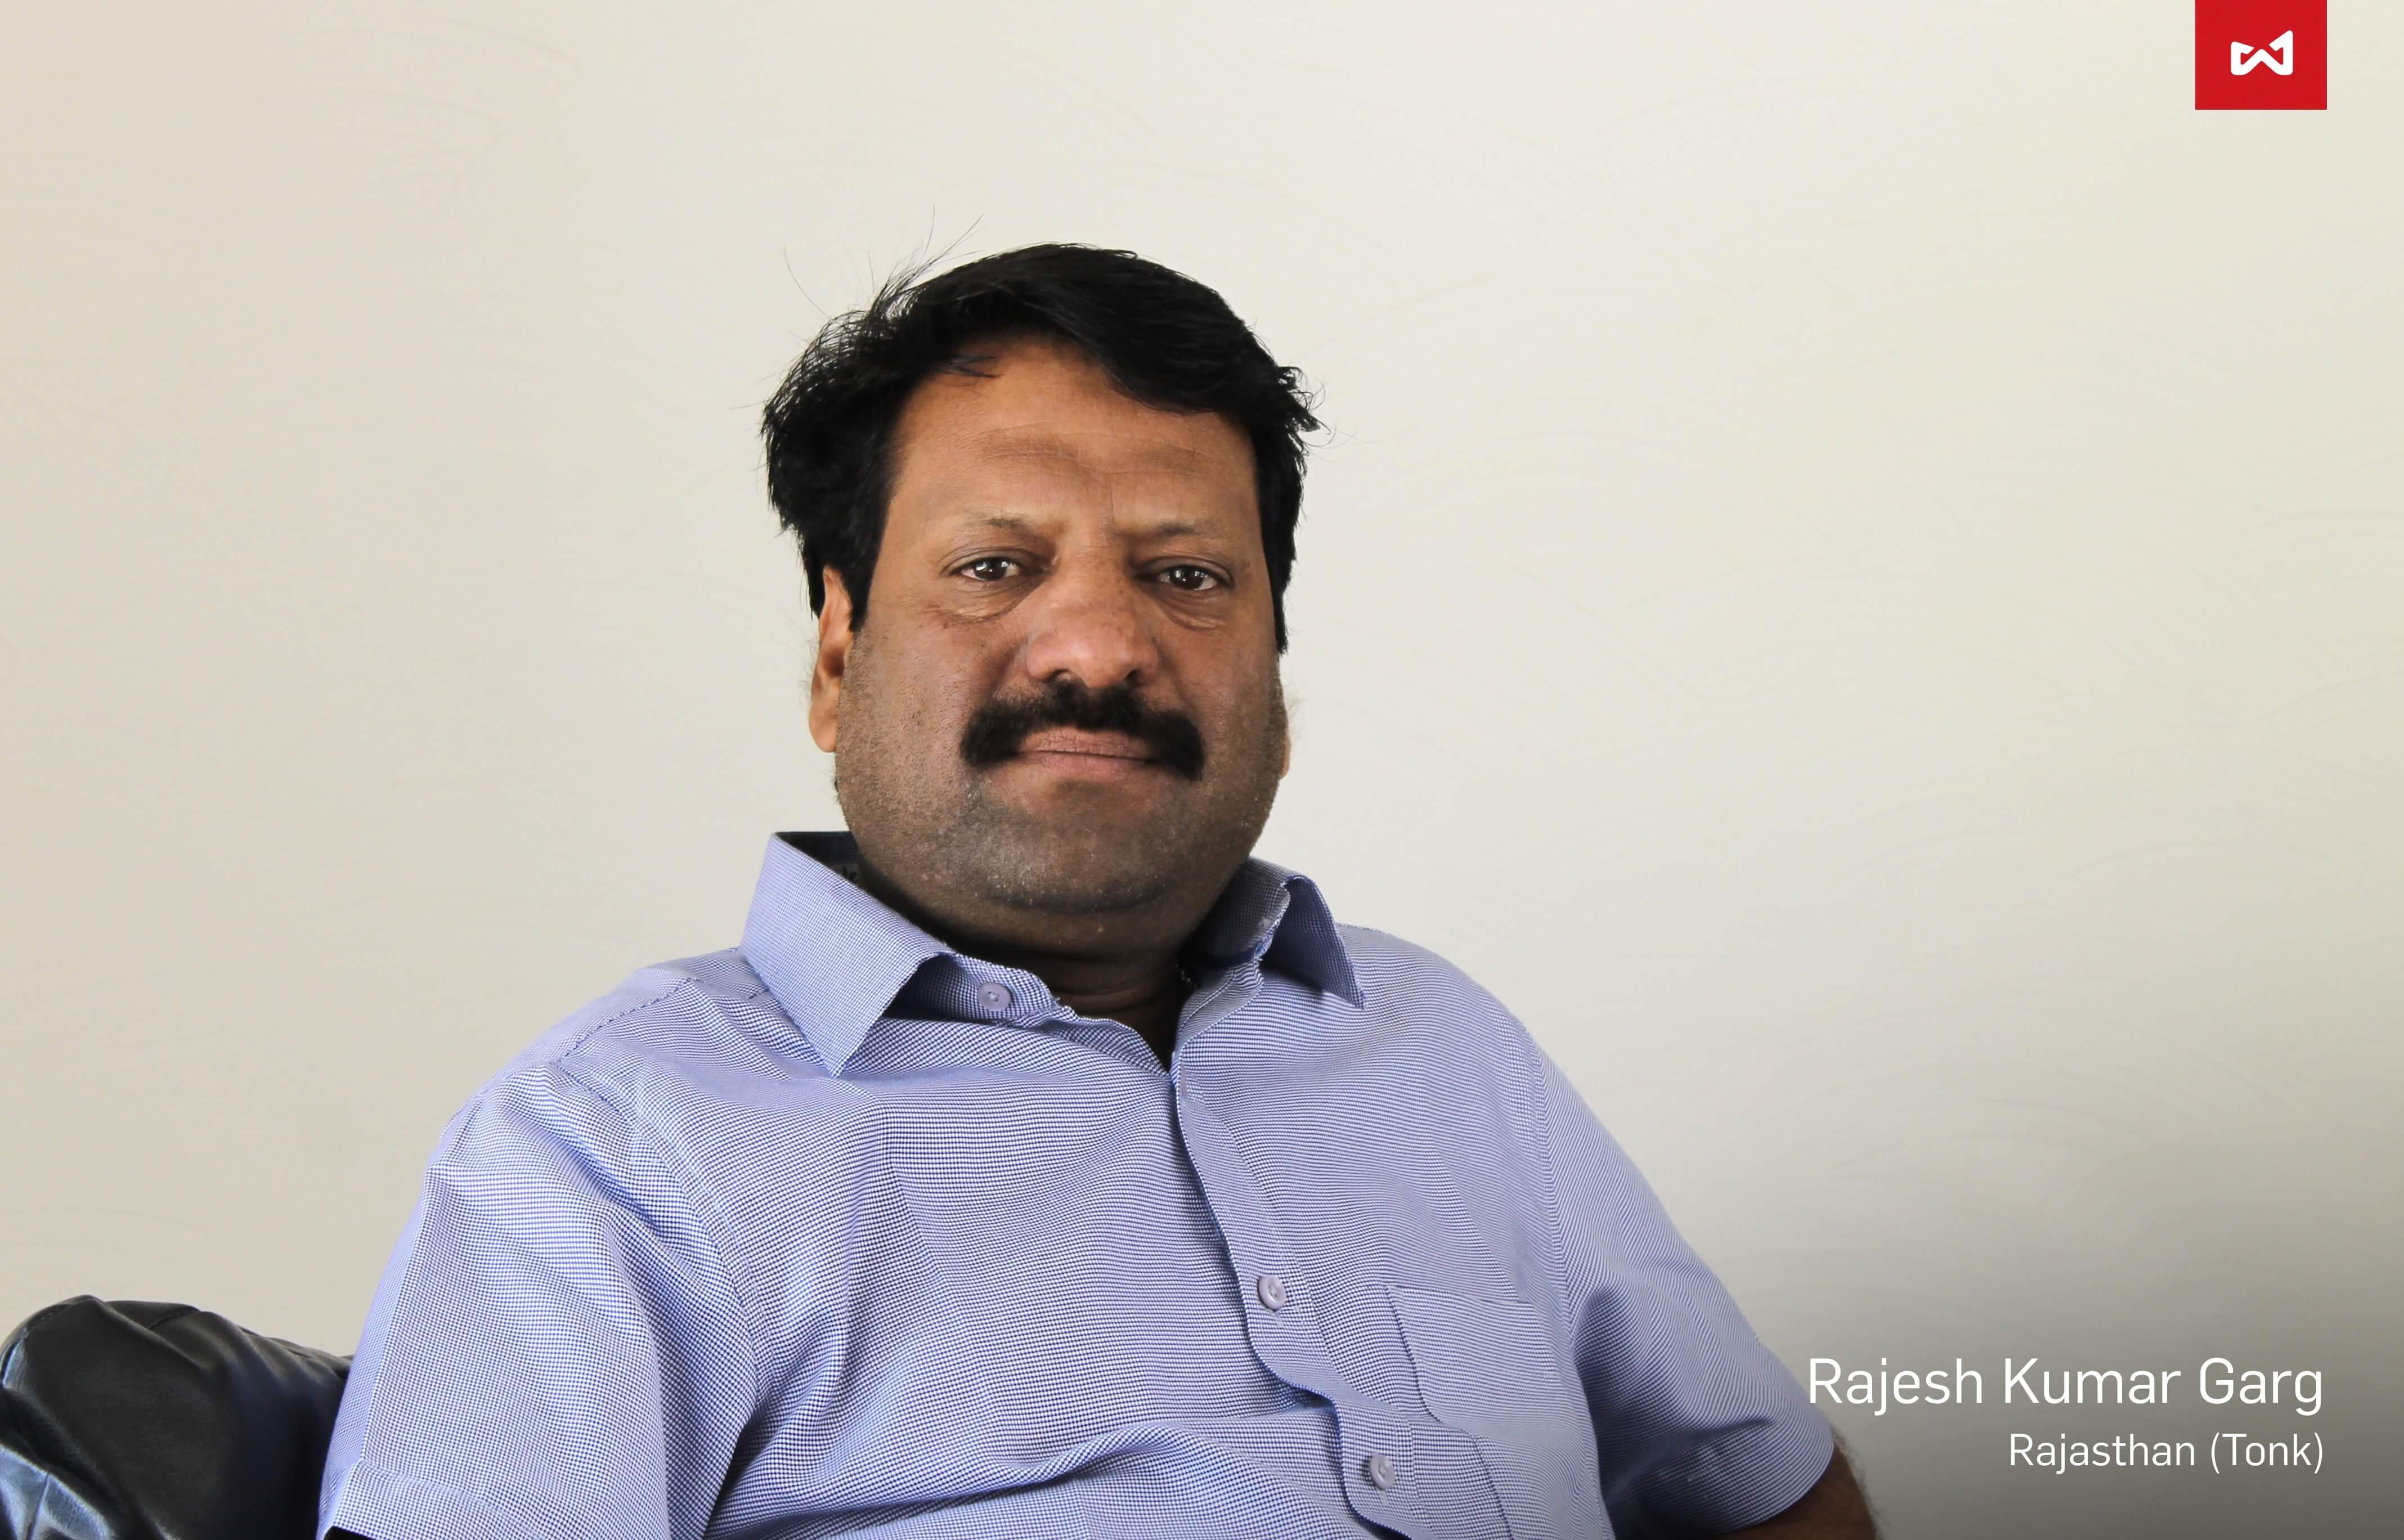 Rajesh Kumar Garg